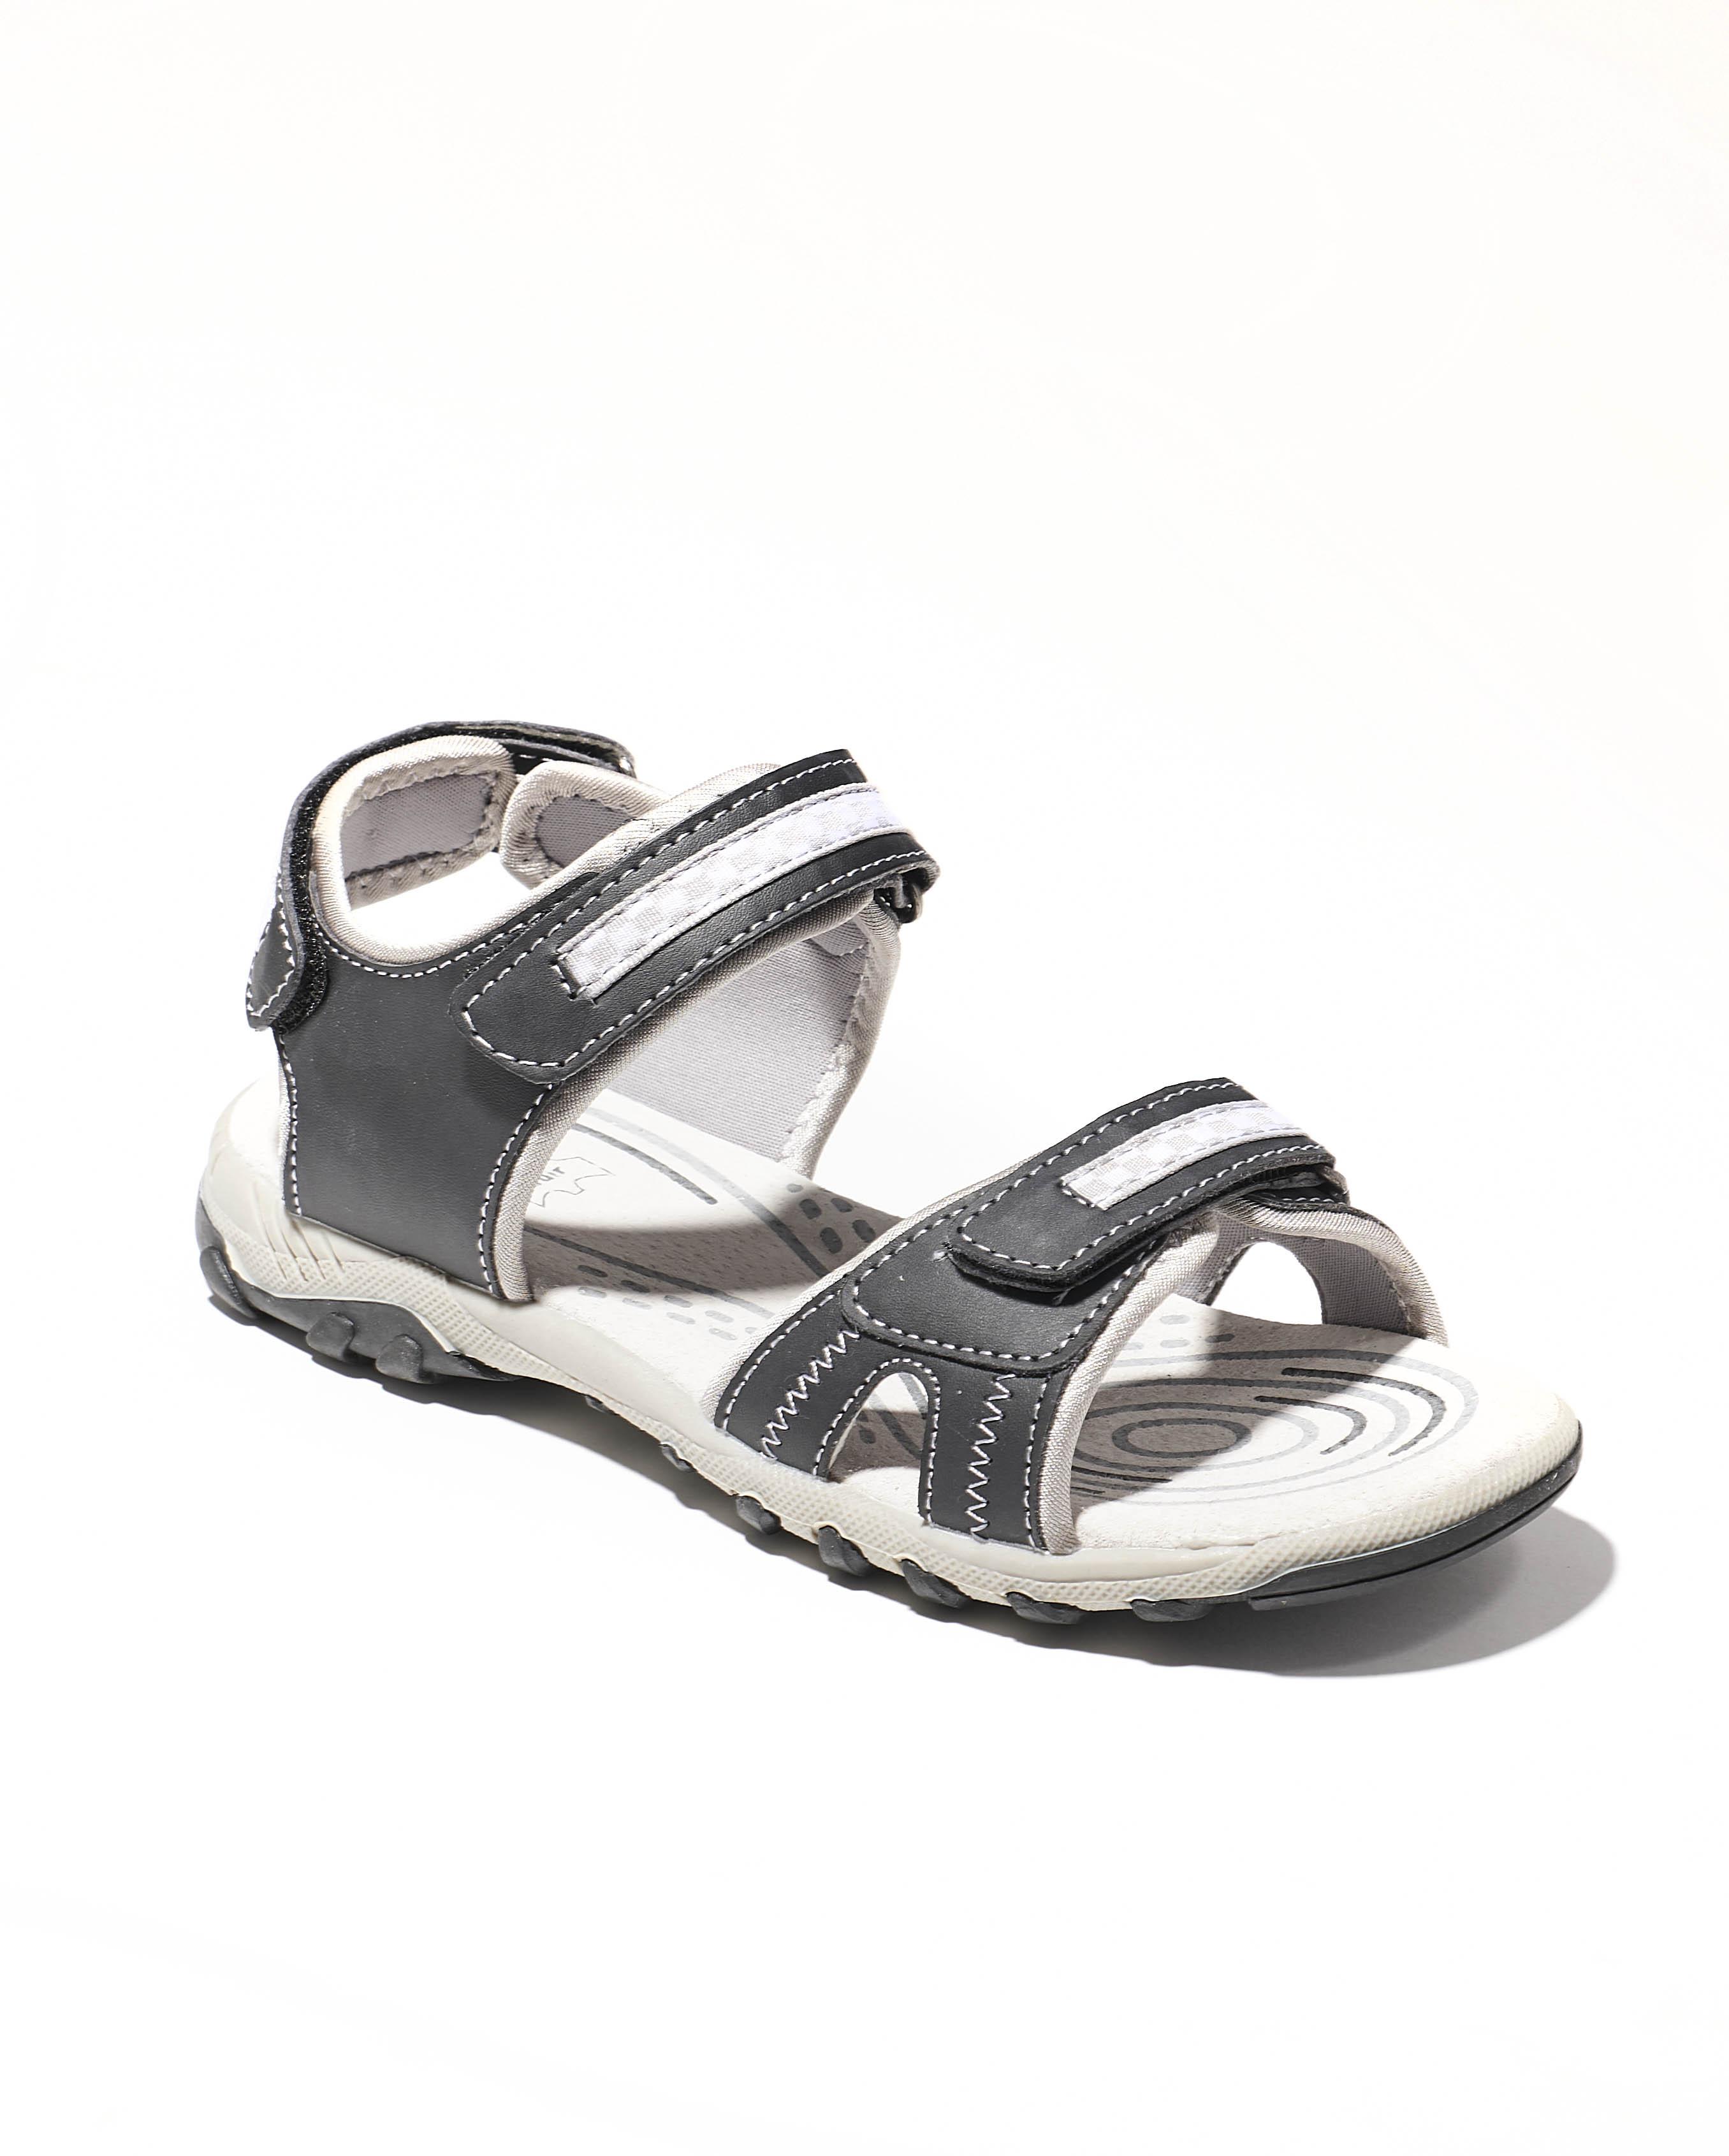 Sandales Garçon - Sandale Ouverte Noir Jina - Xdb18036 Velcro